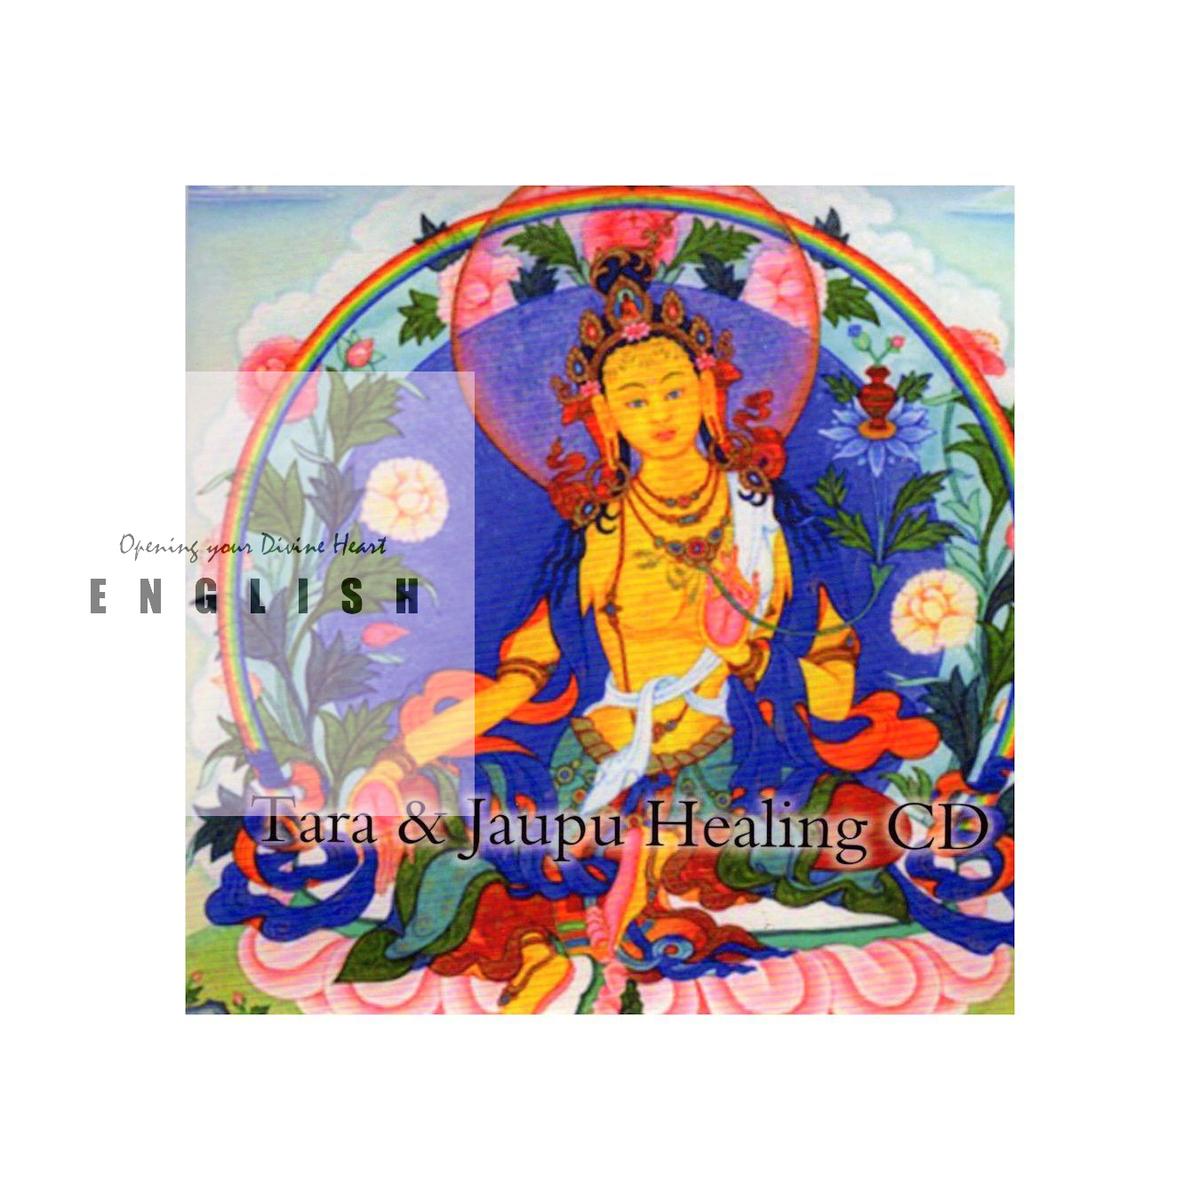 TARA & JAUPU HEALING CD - Meditation CD